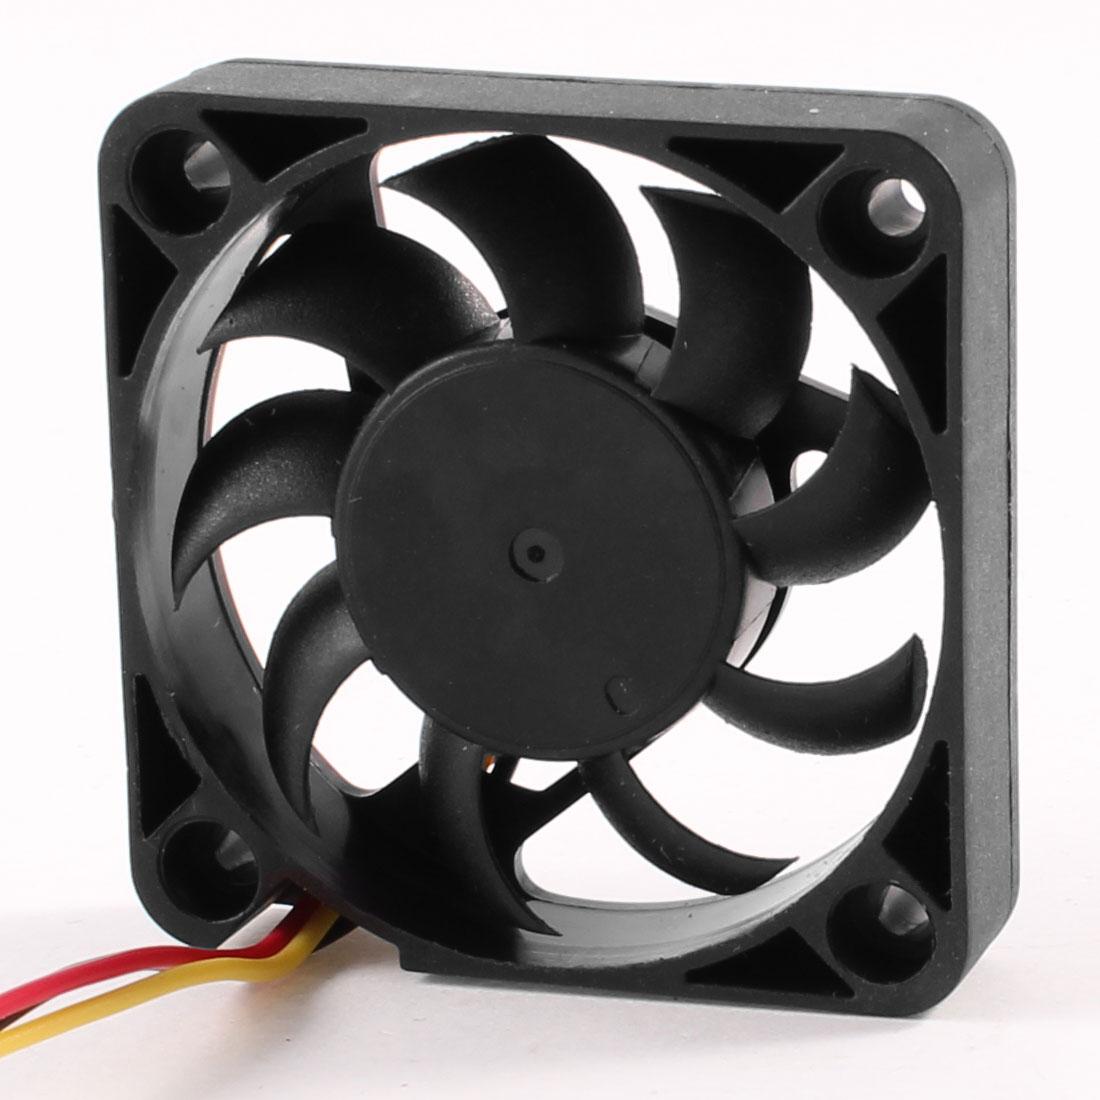 Laptop Computer Case 3 Pins Connector CPU Cooling Fan 50mmx50mm DC 12V Black